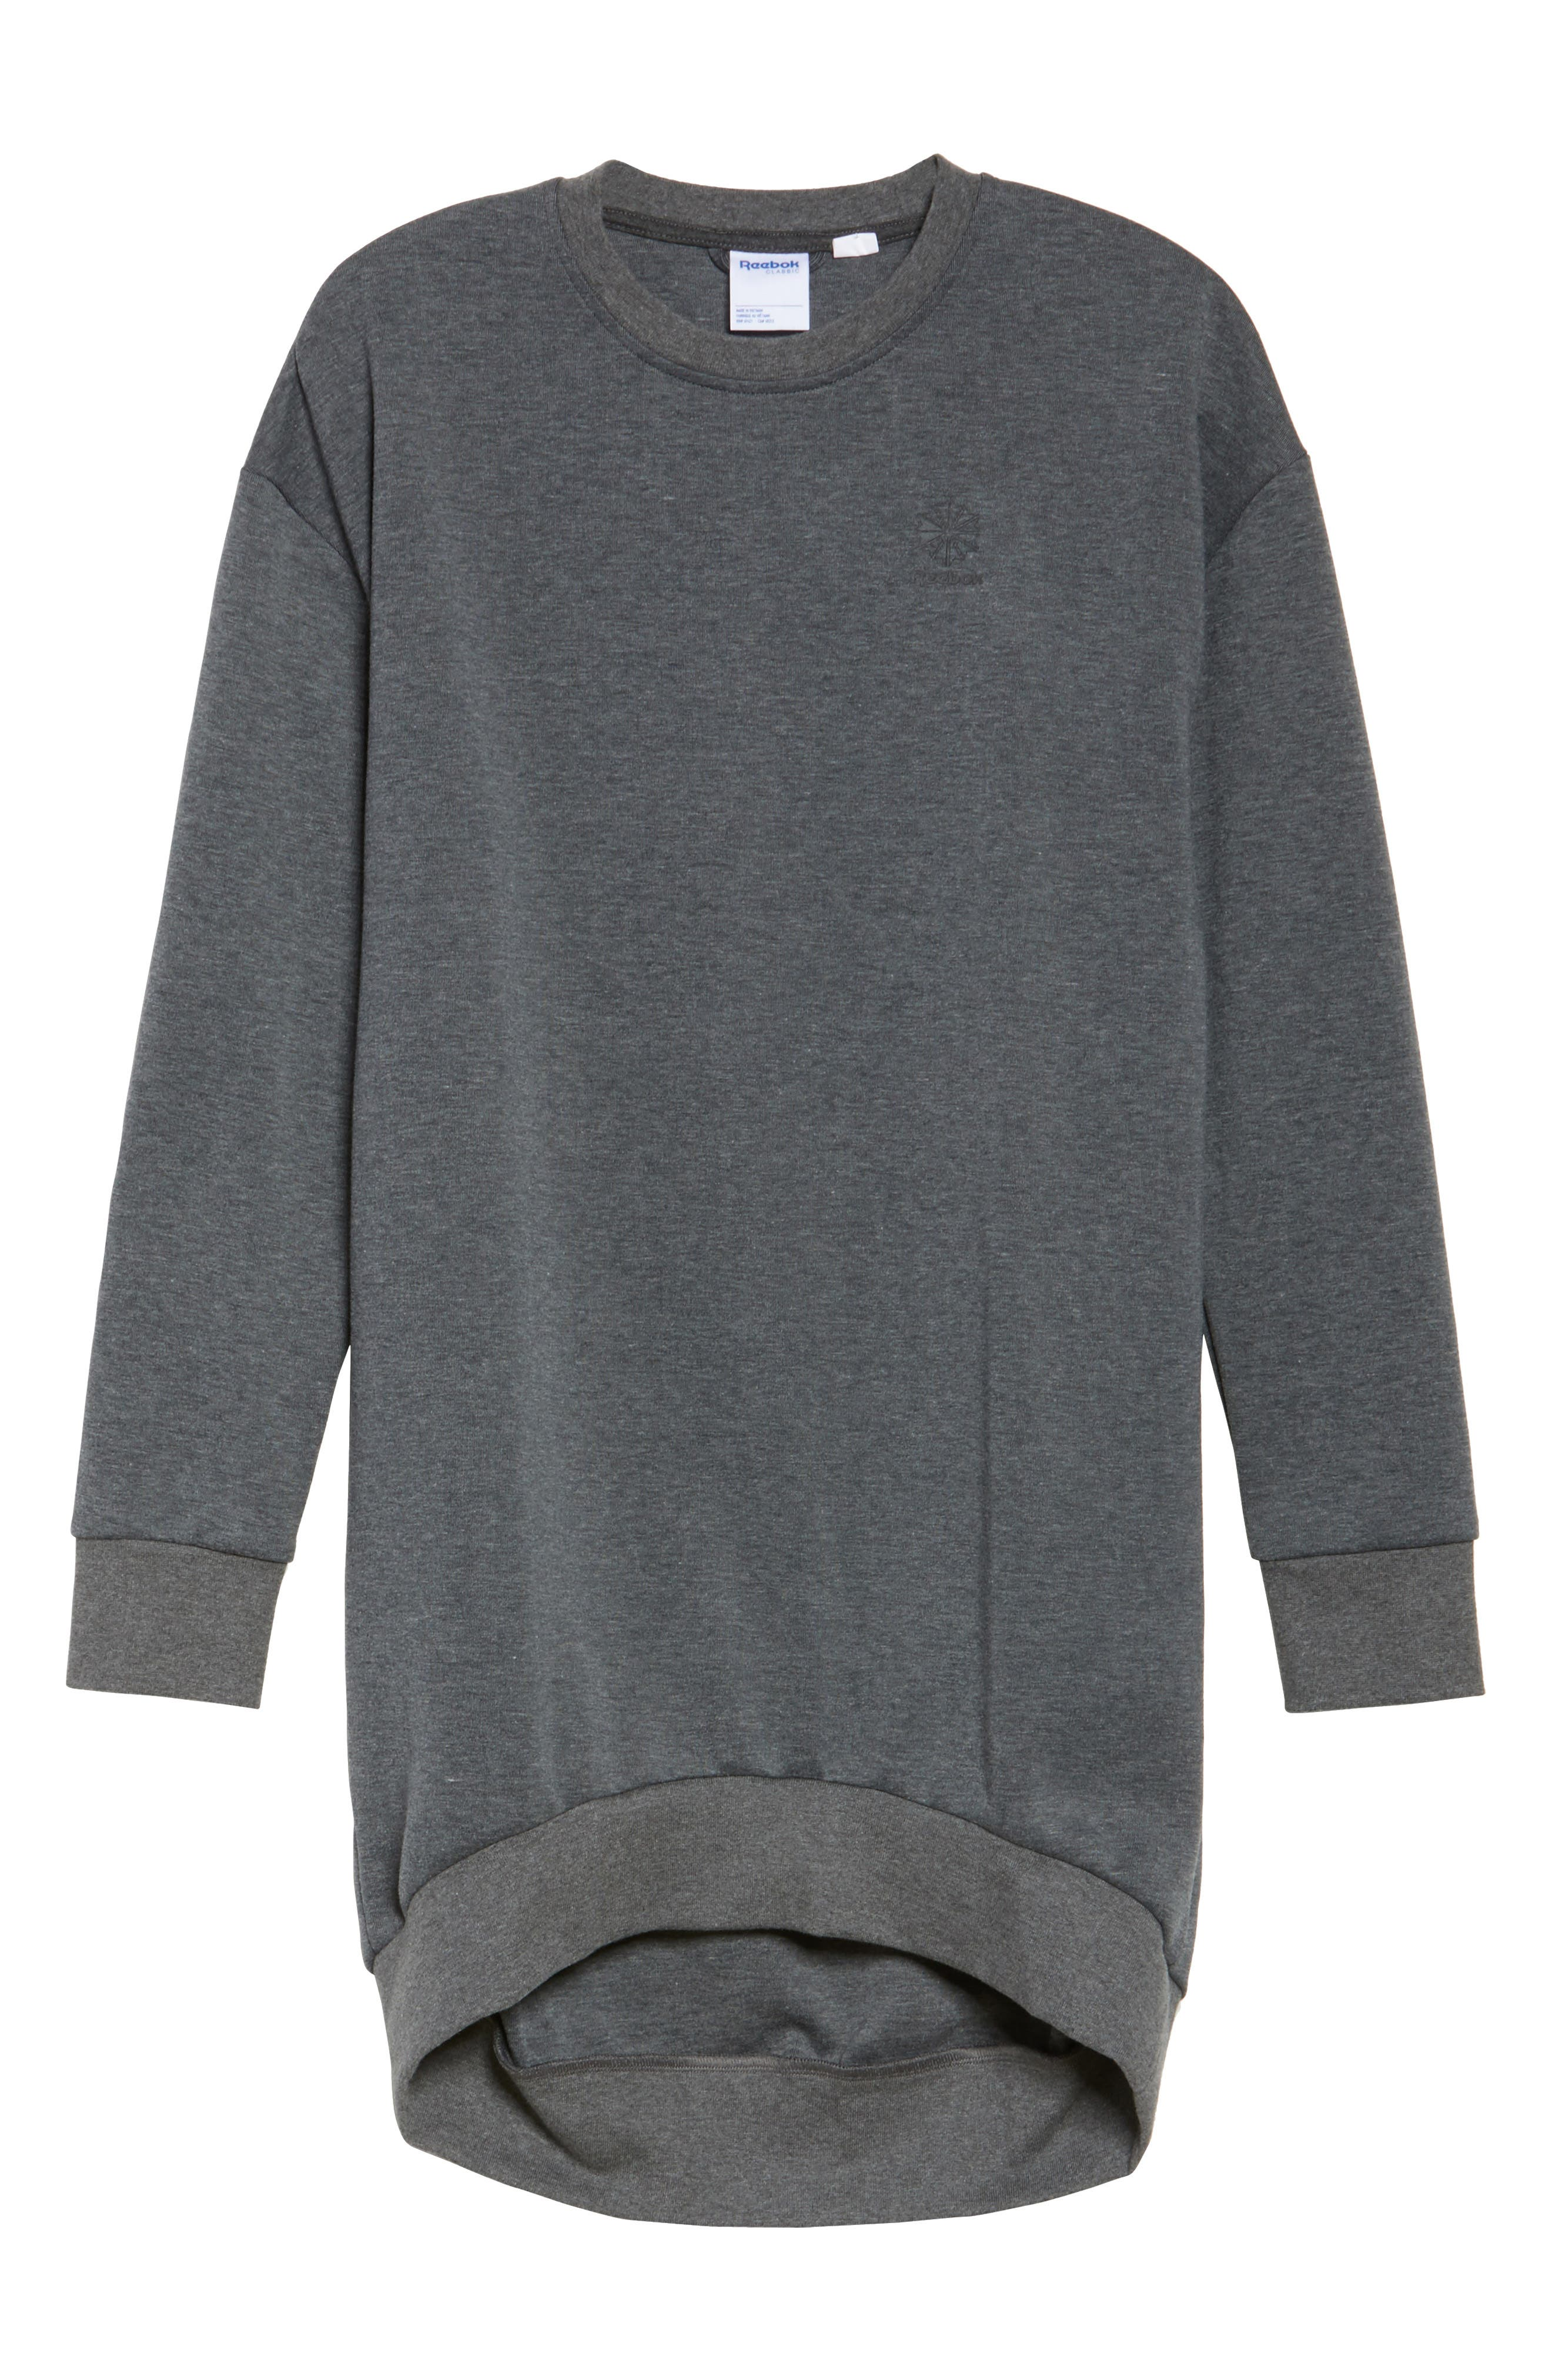 Oversize Sweatshirt,                             Alternate thumbnail 7, color,                             Dark Grey Heather